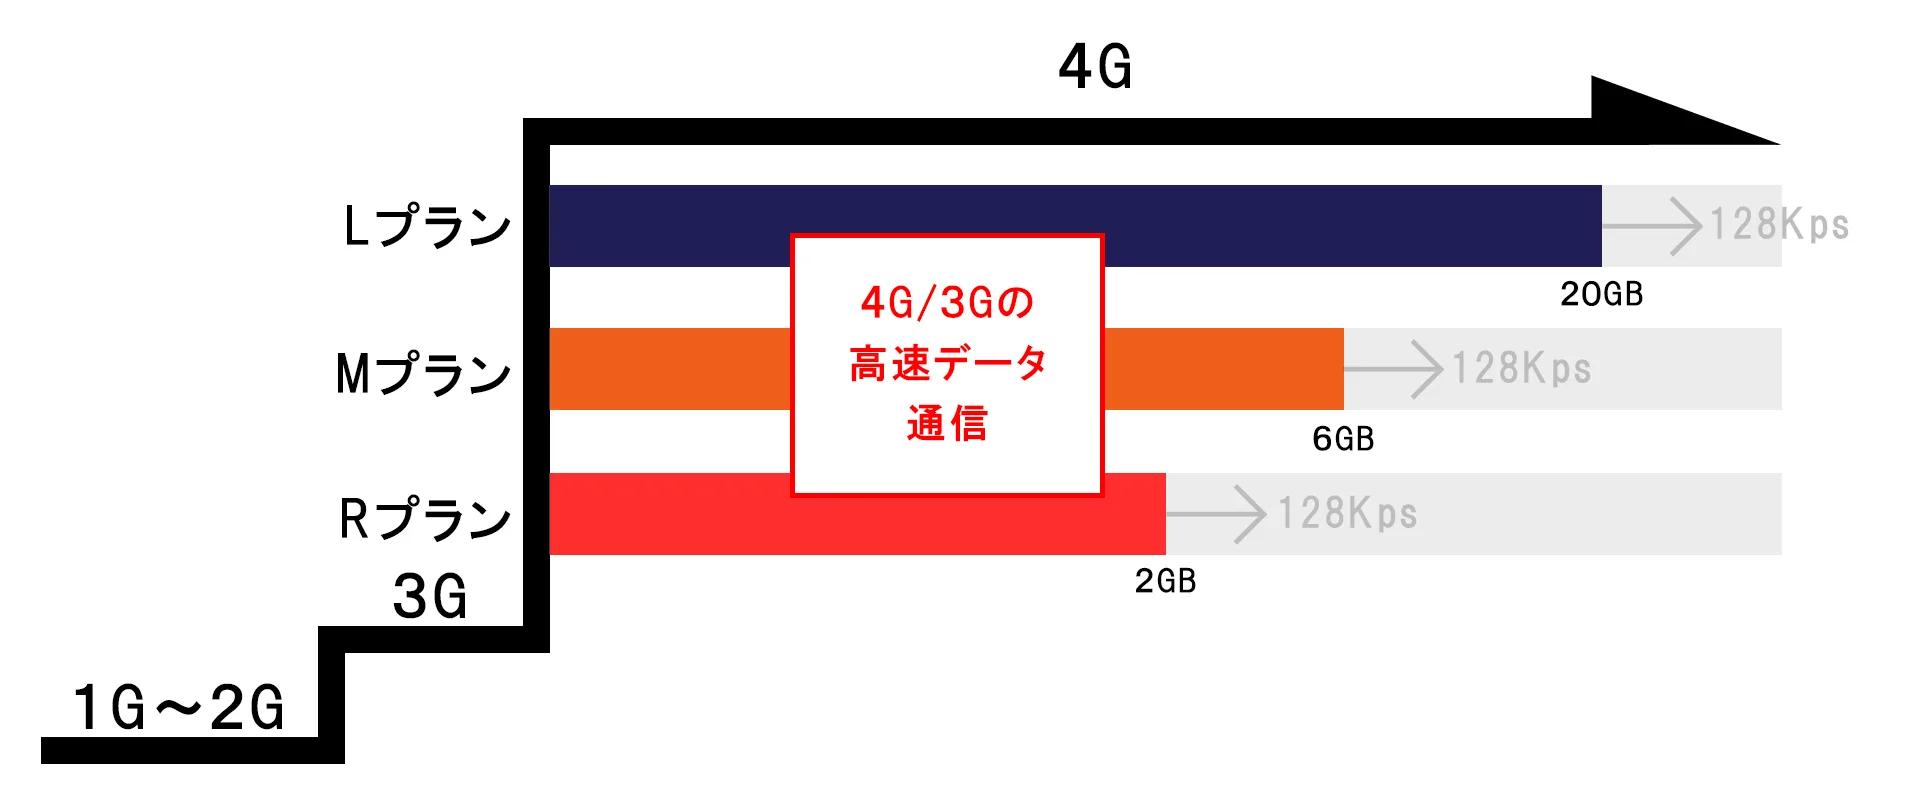 4G/5G通信にも対応